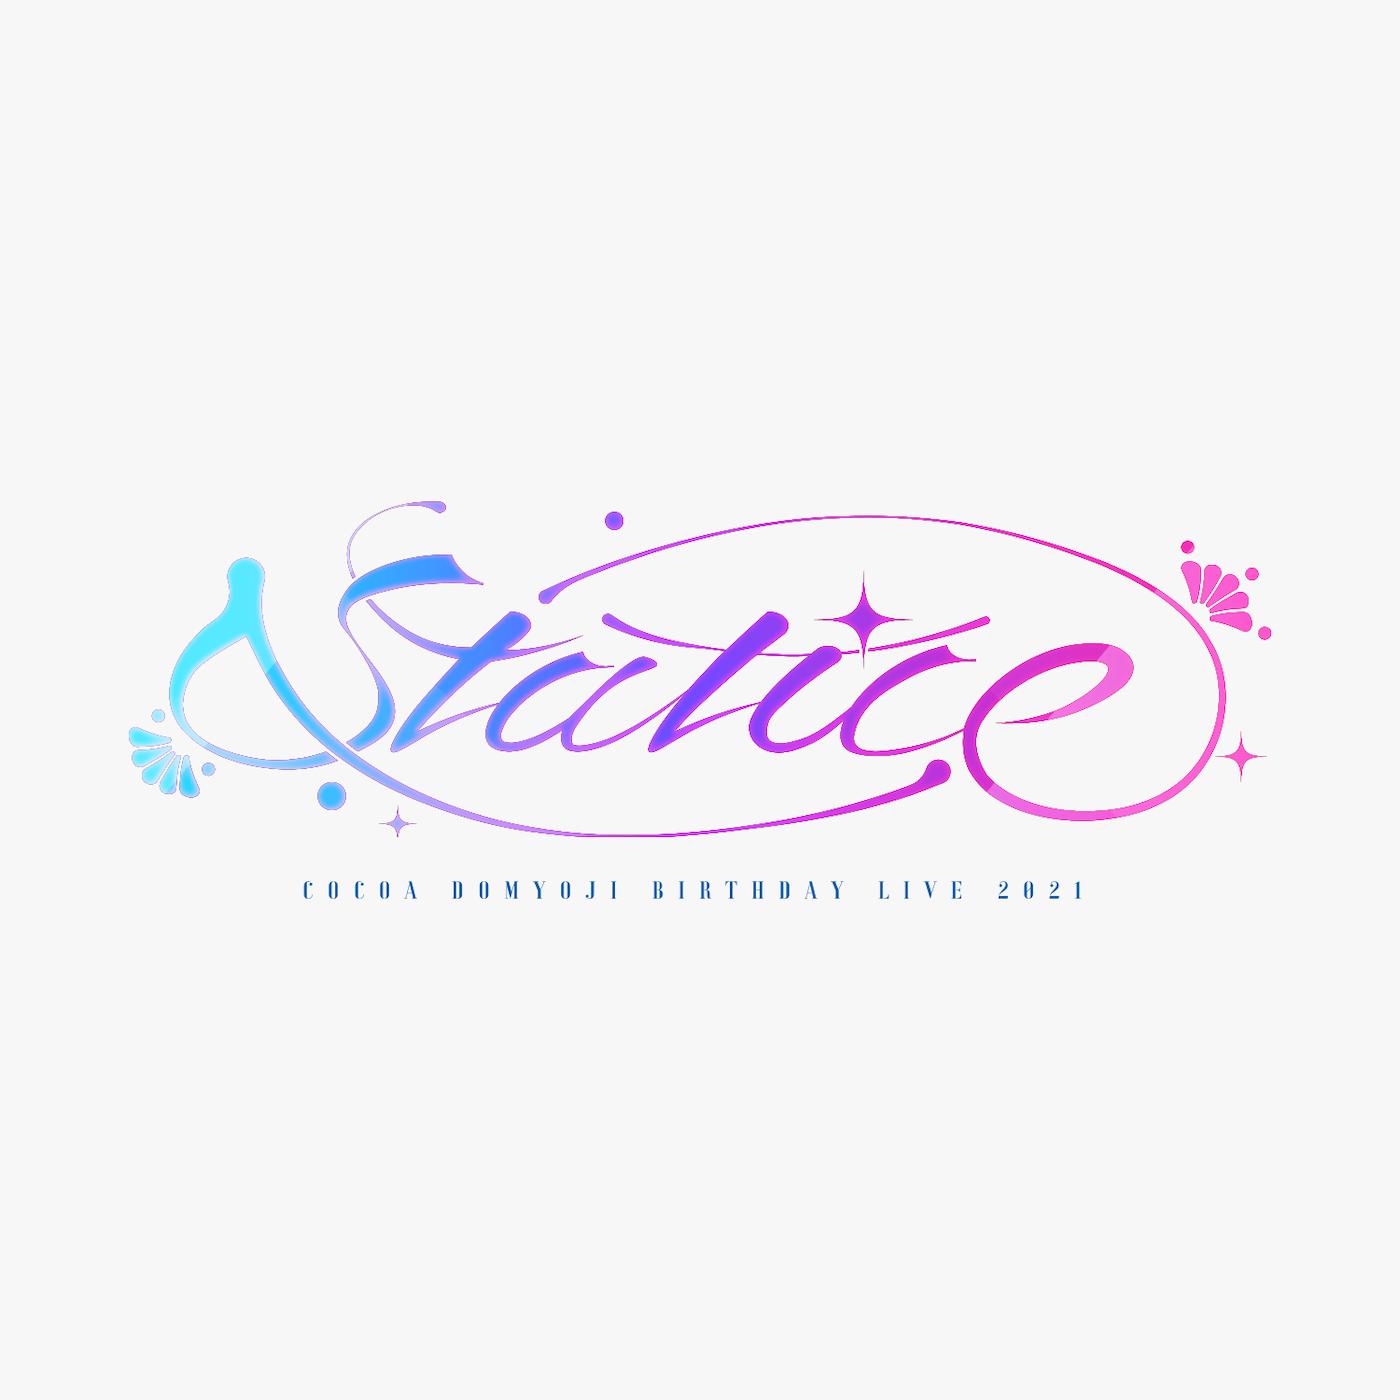 Statice(イベントロゴデザイン)